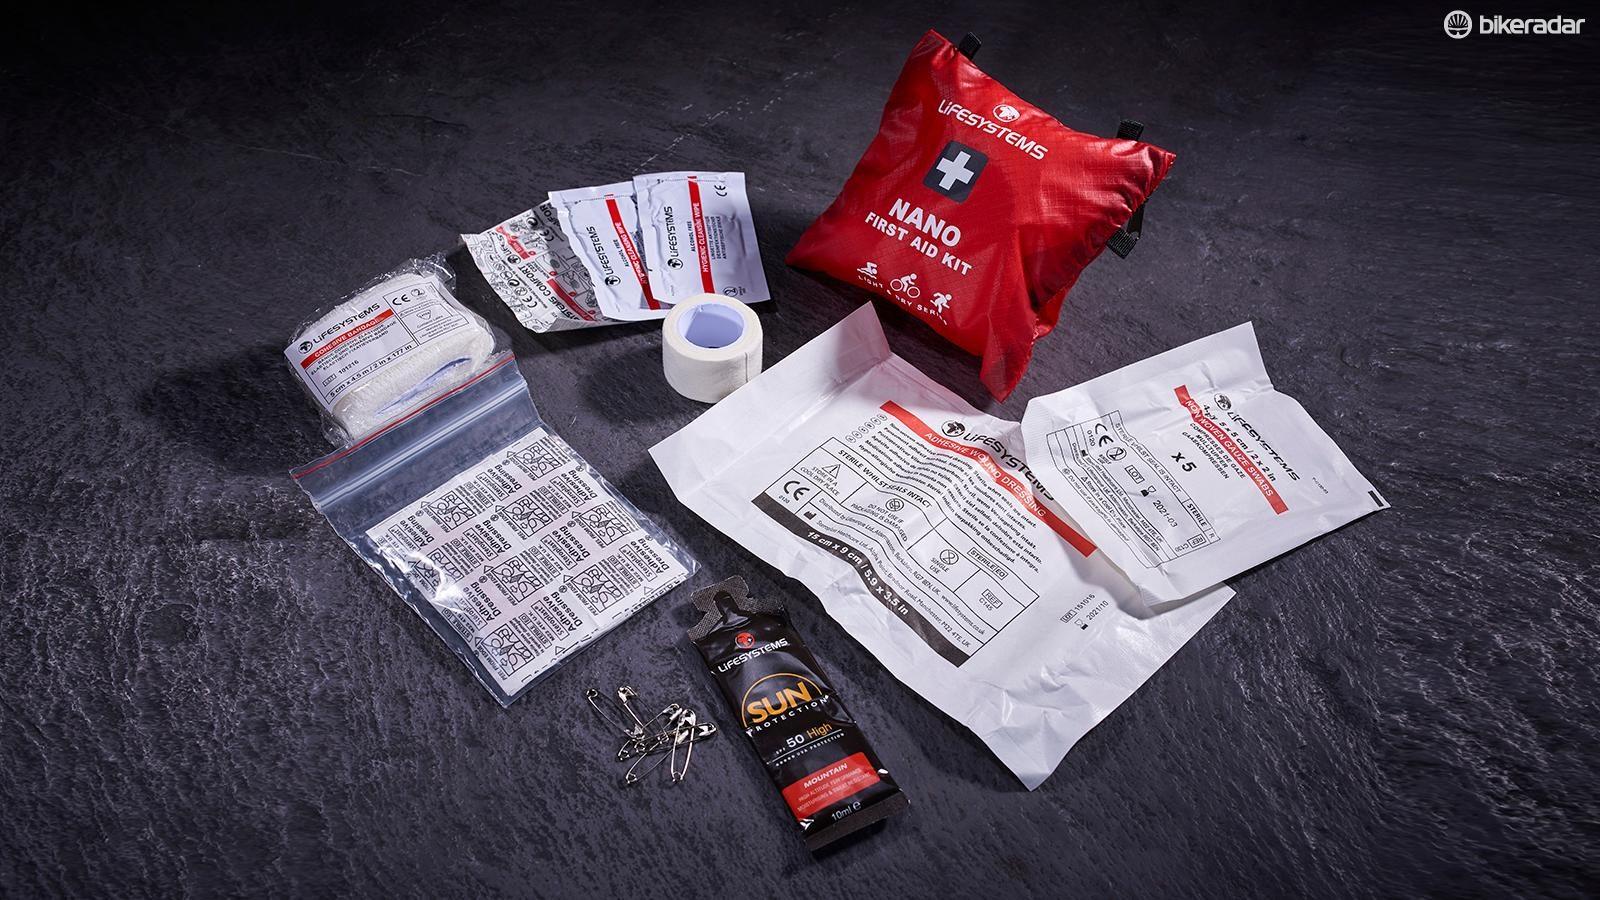 Lifesystems Light /& Dry Nano First Aid Kit